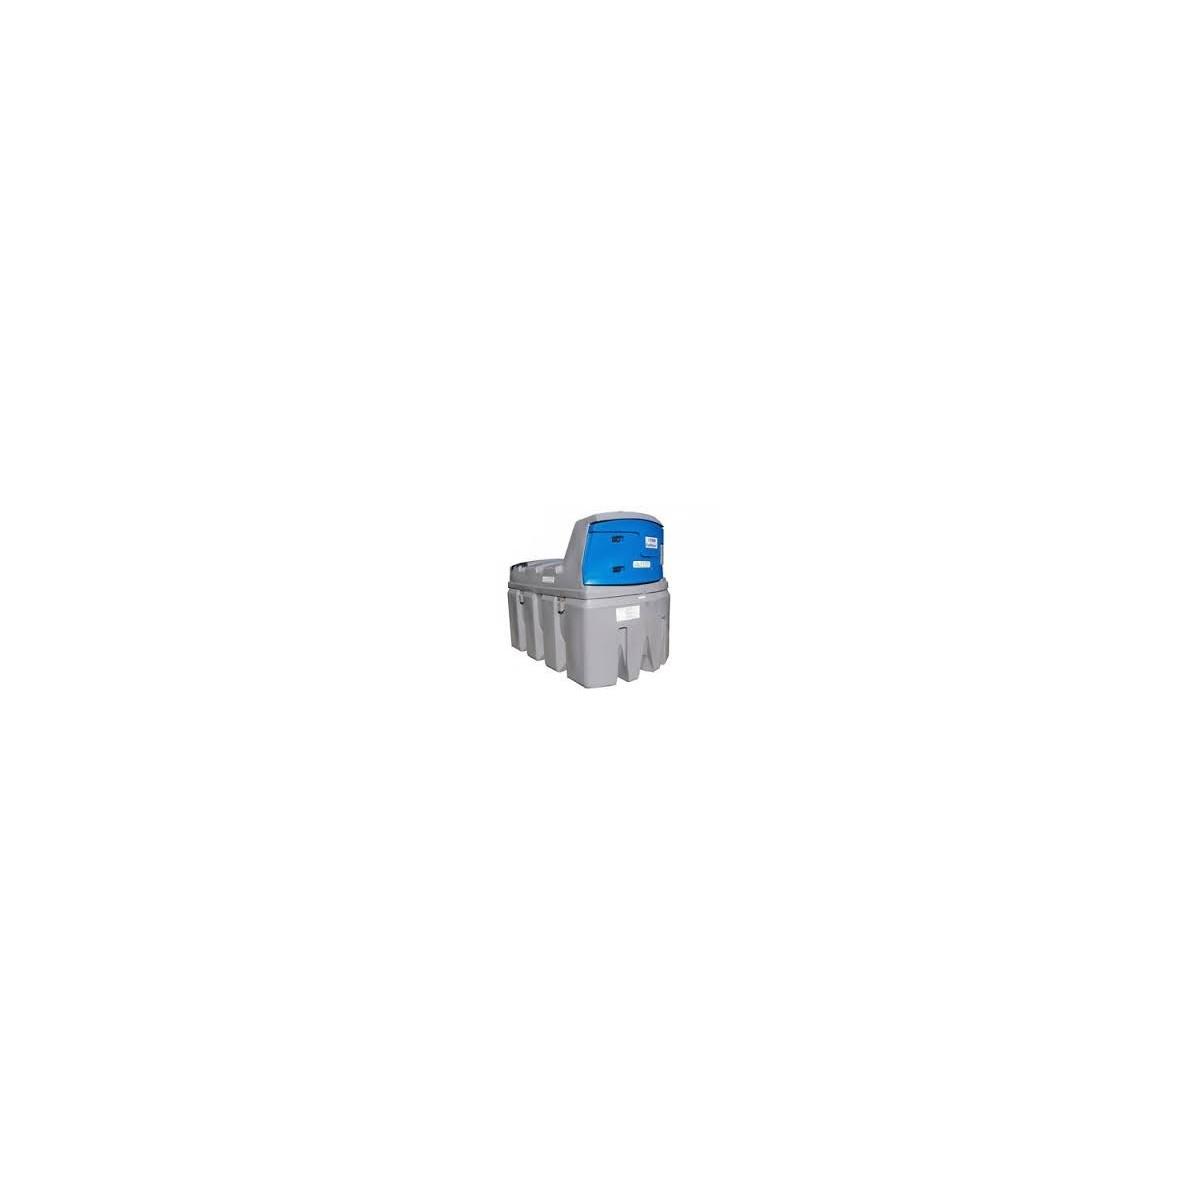 Zbiornik na paliwo FuelMaster Light 2500L